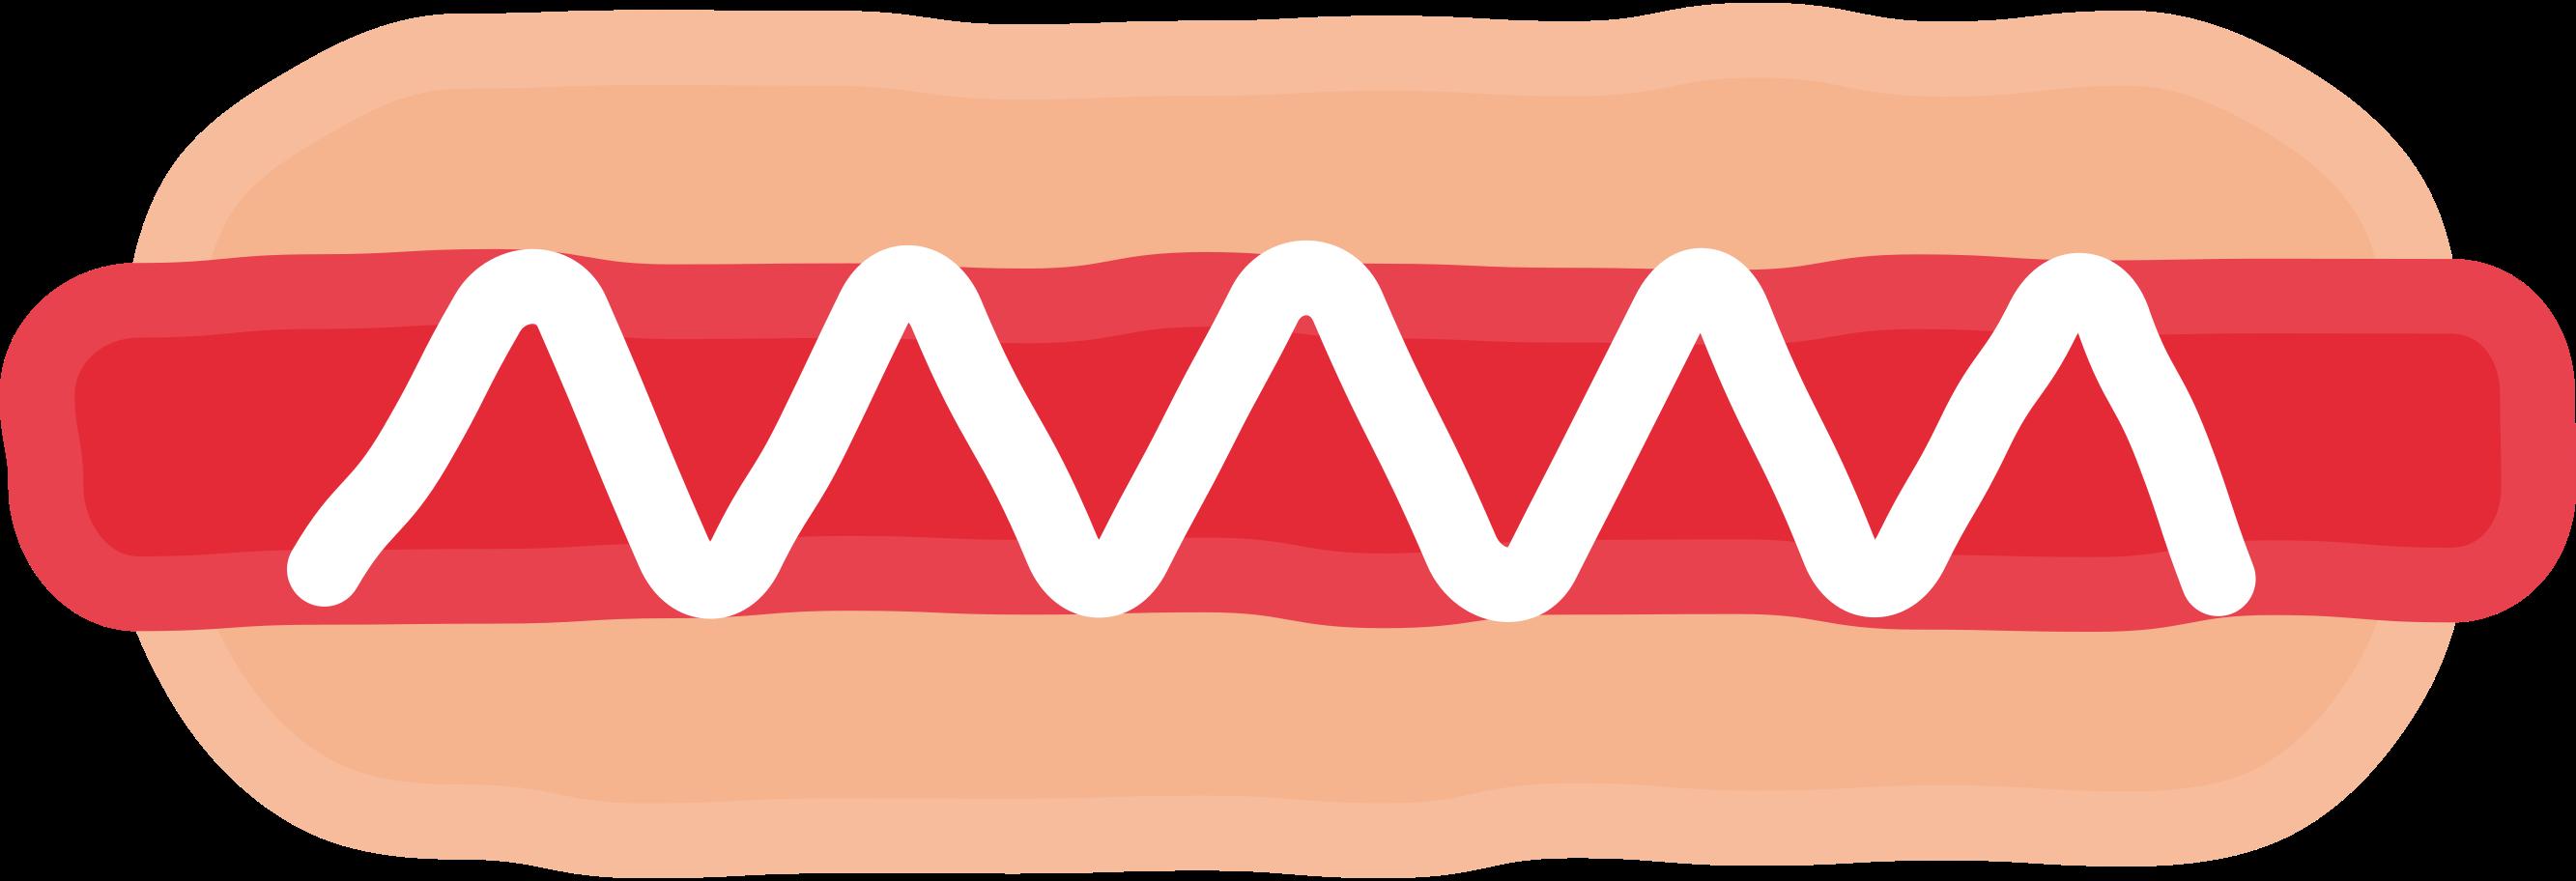 Style  hot-dog Images vectorielles en PNG et SVG | Icons8 Illustrations